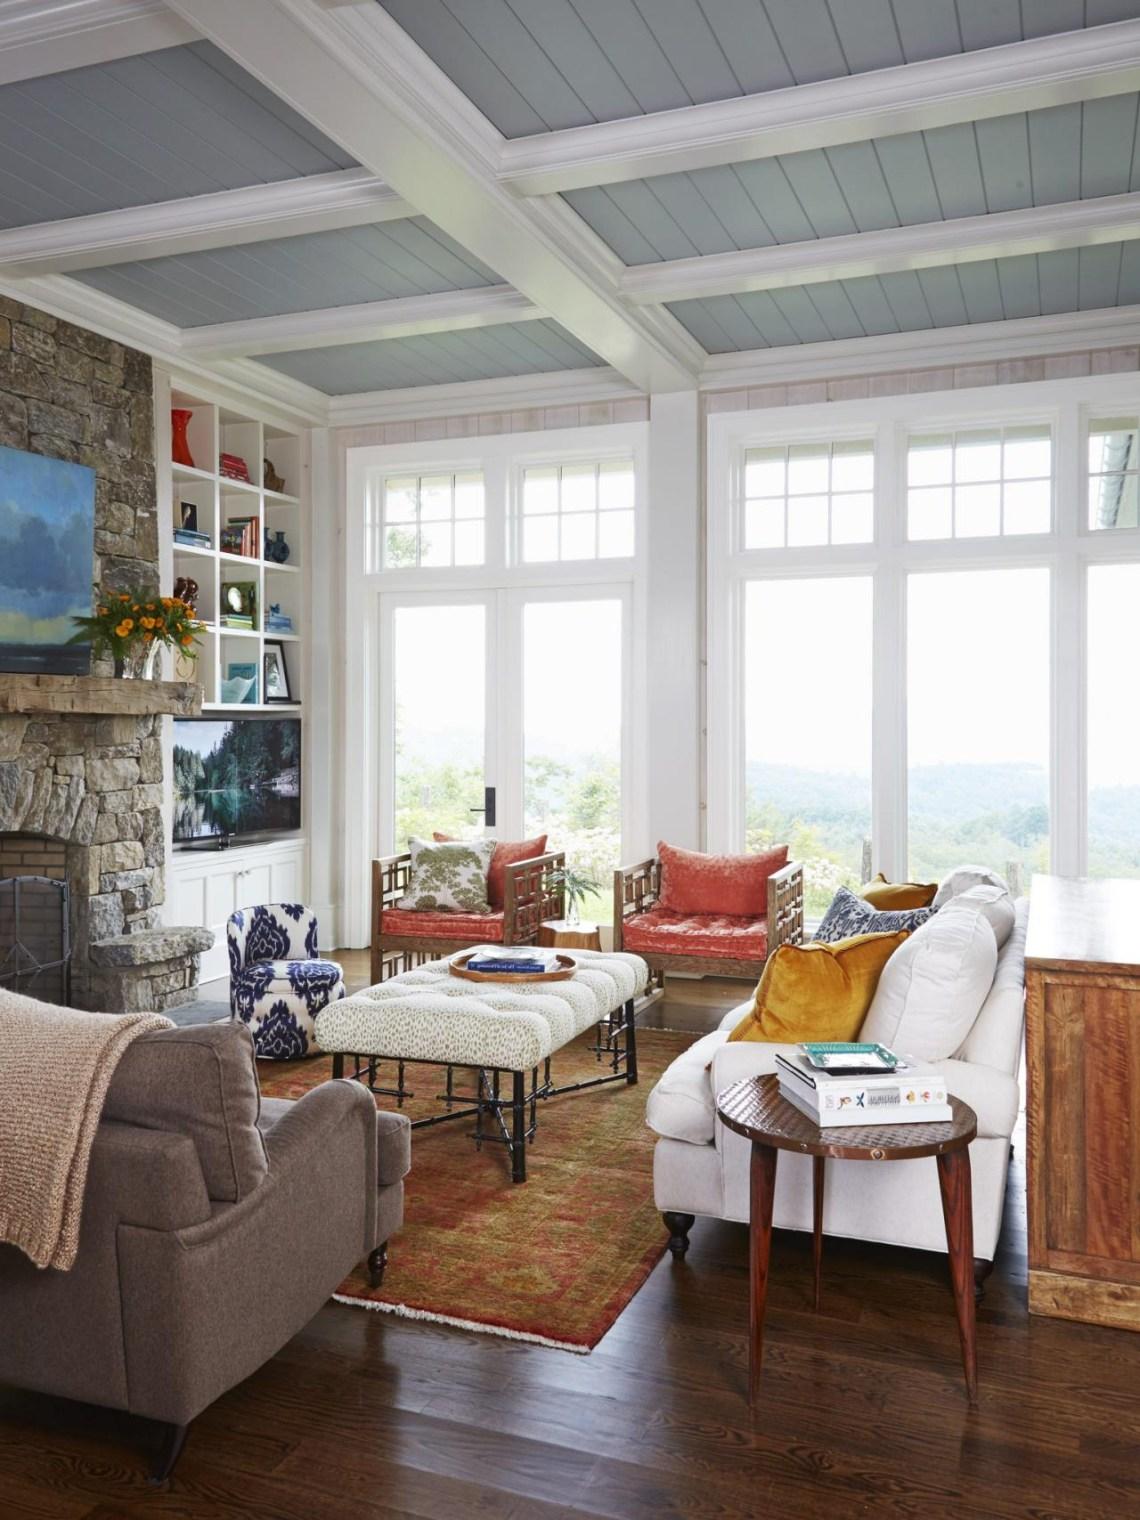 7 Low Budget Living Room Updates Hgtvs Decorating